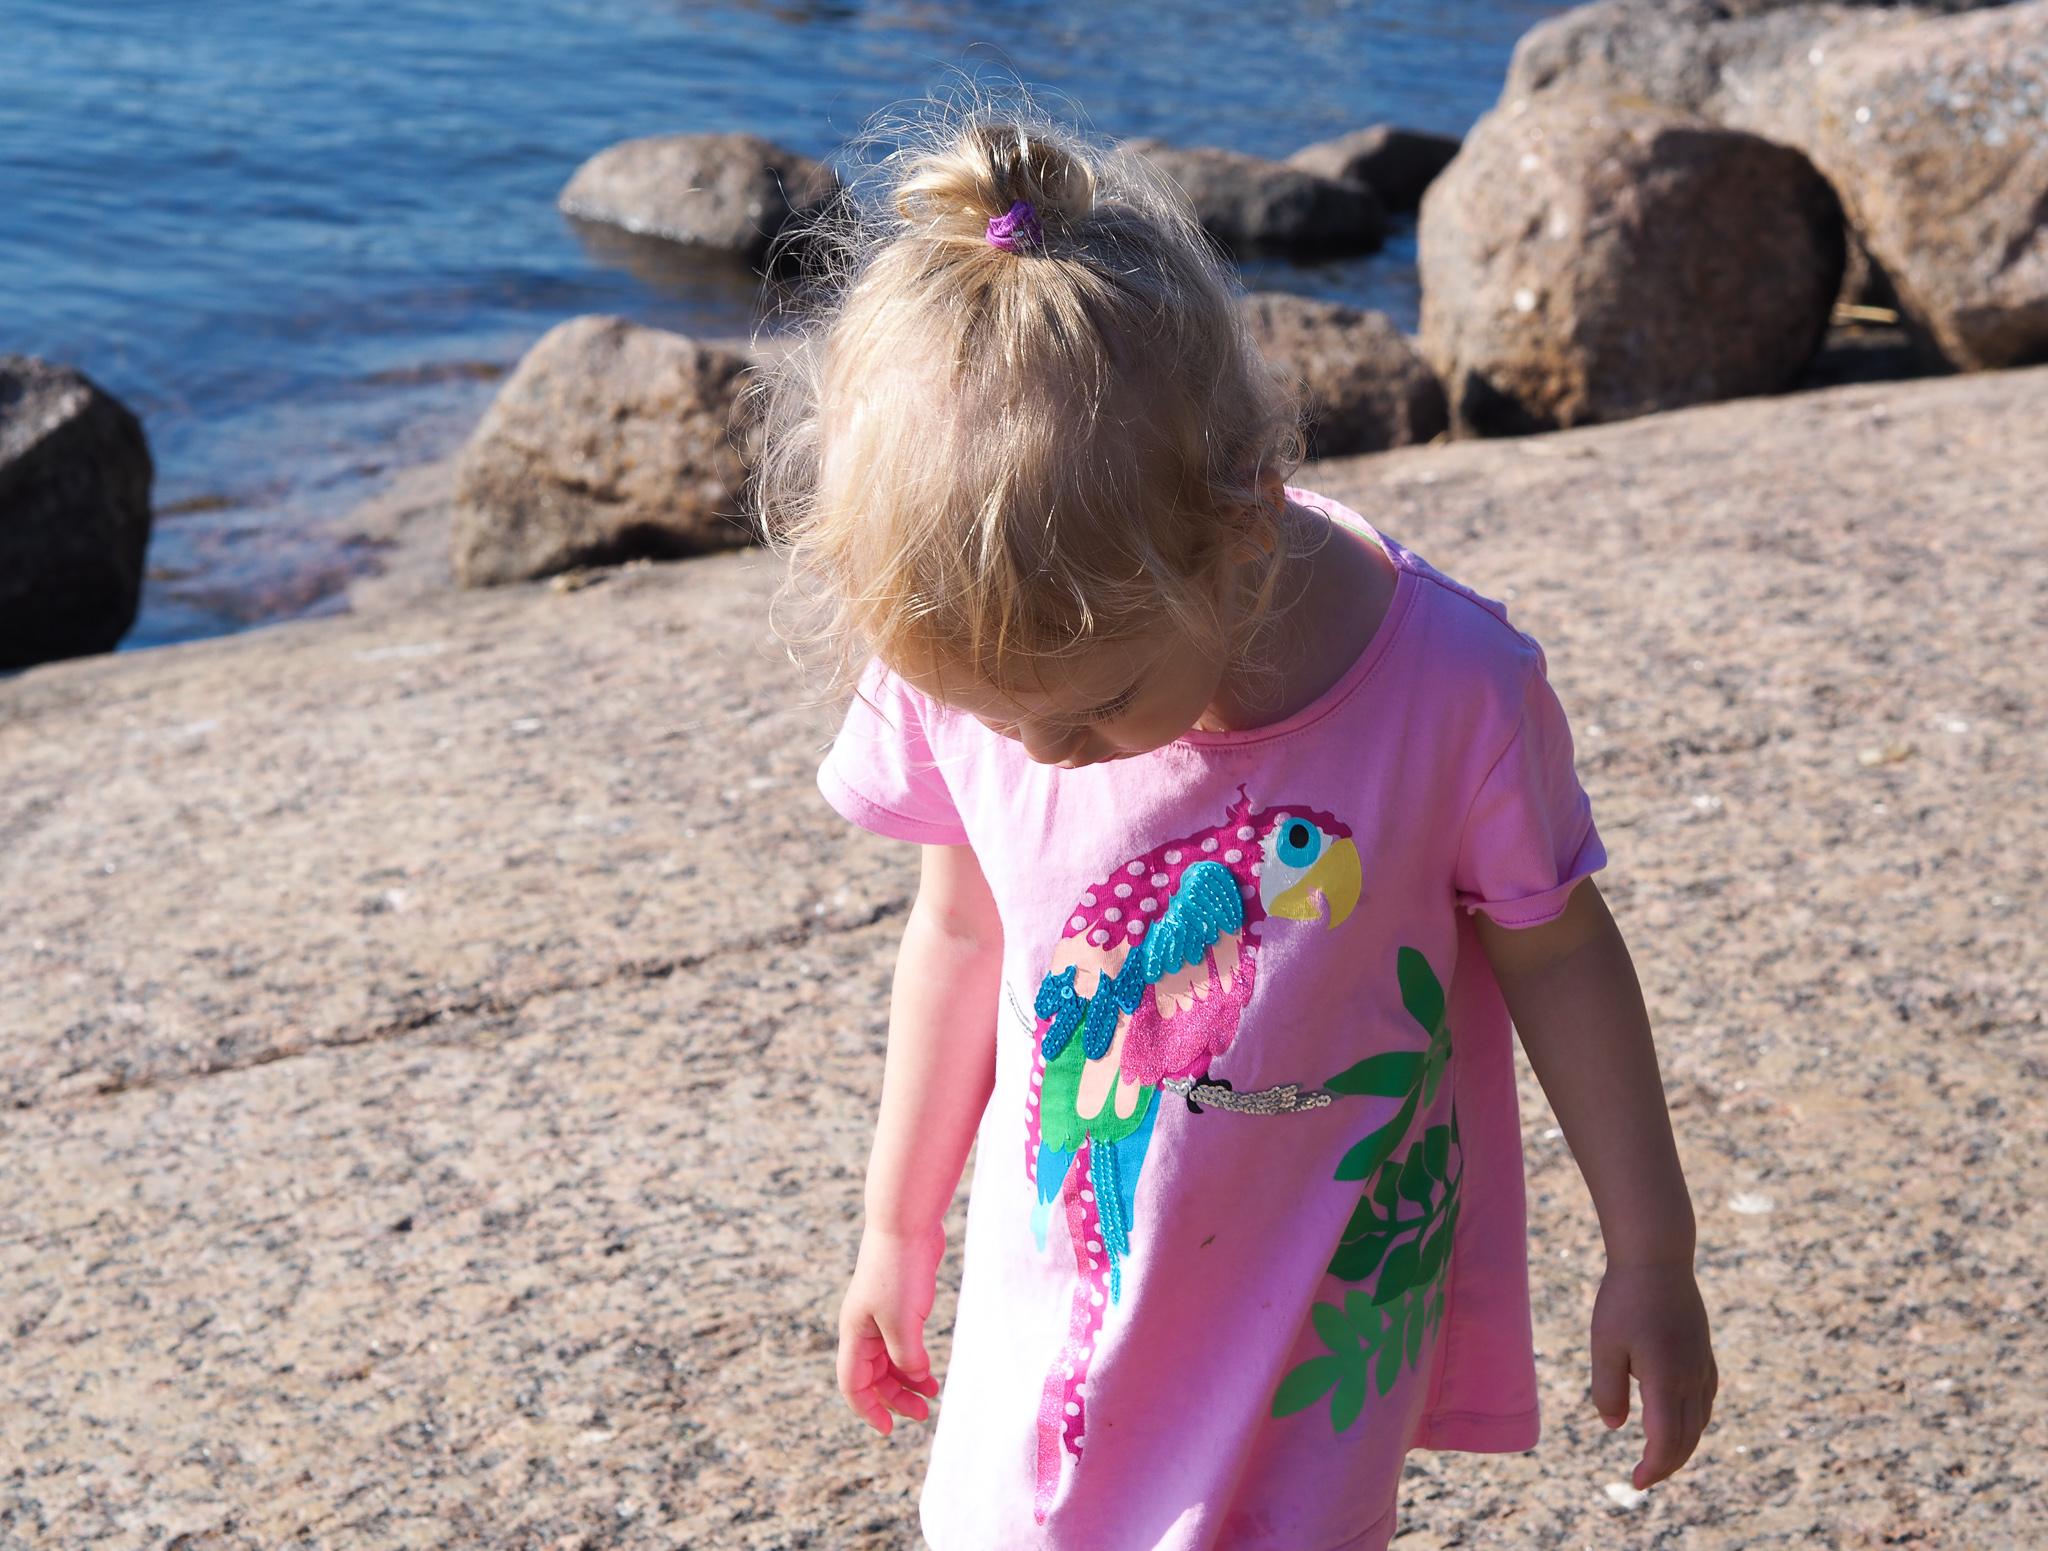 Kesäkuu, ranta, lapsi